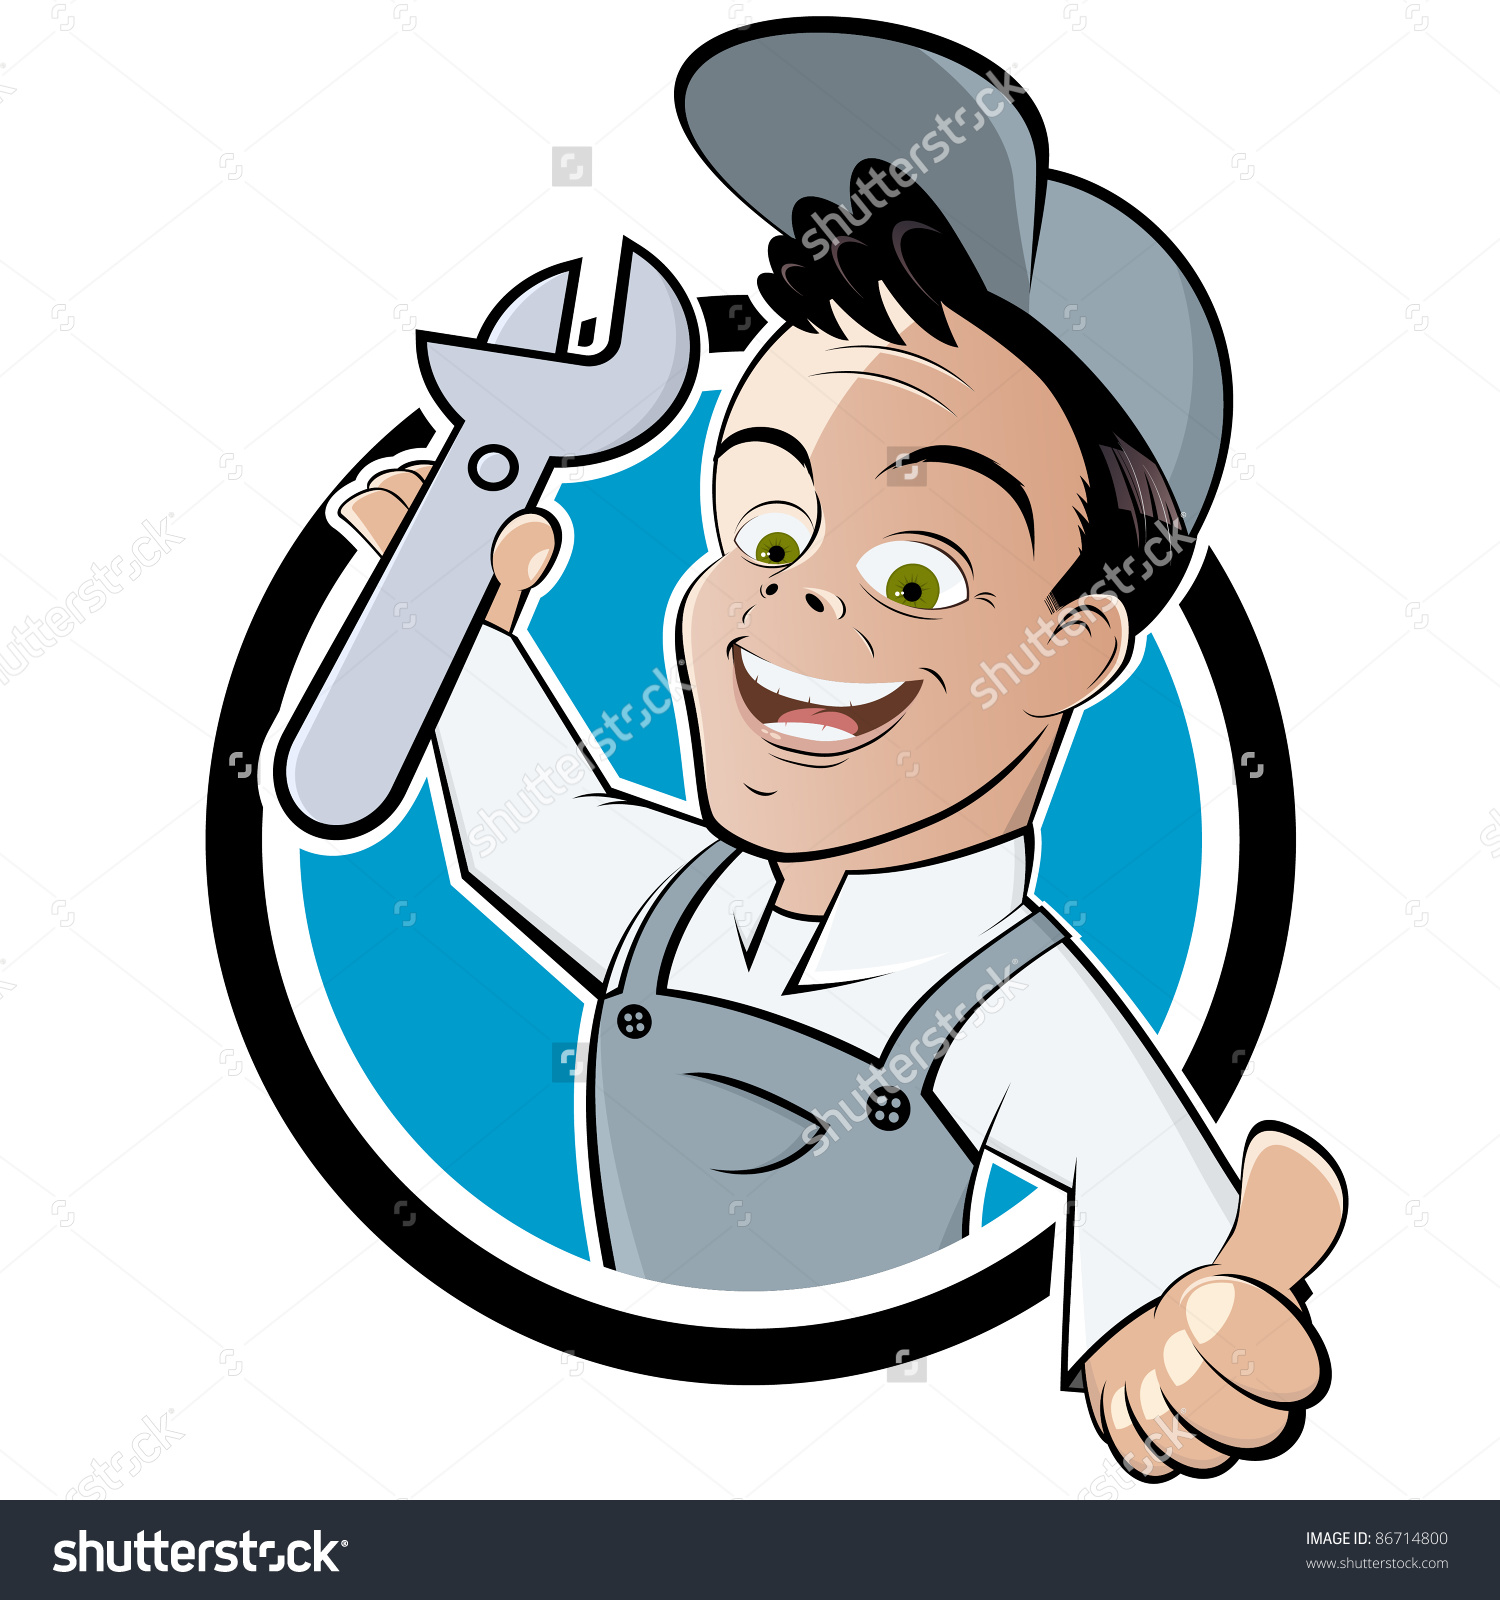 Fixing Hemet CA cartoon image